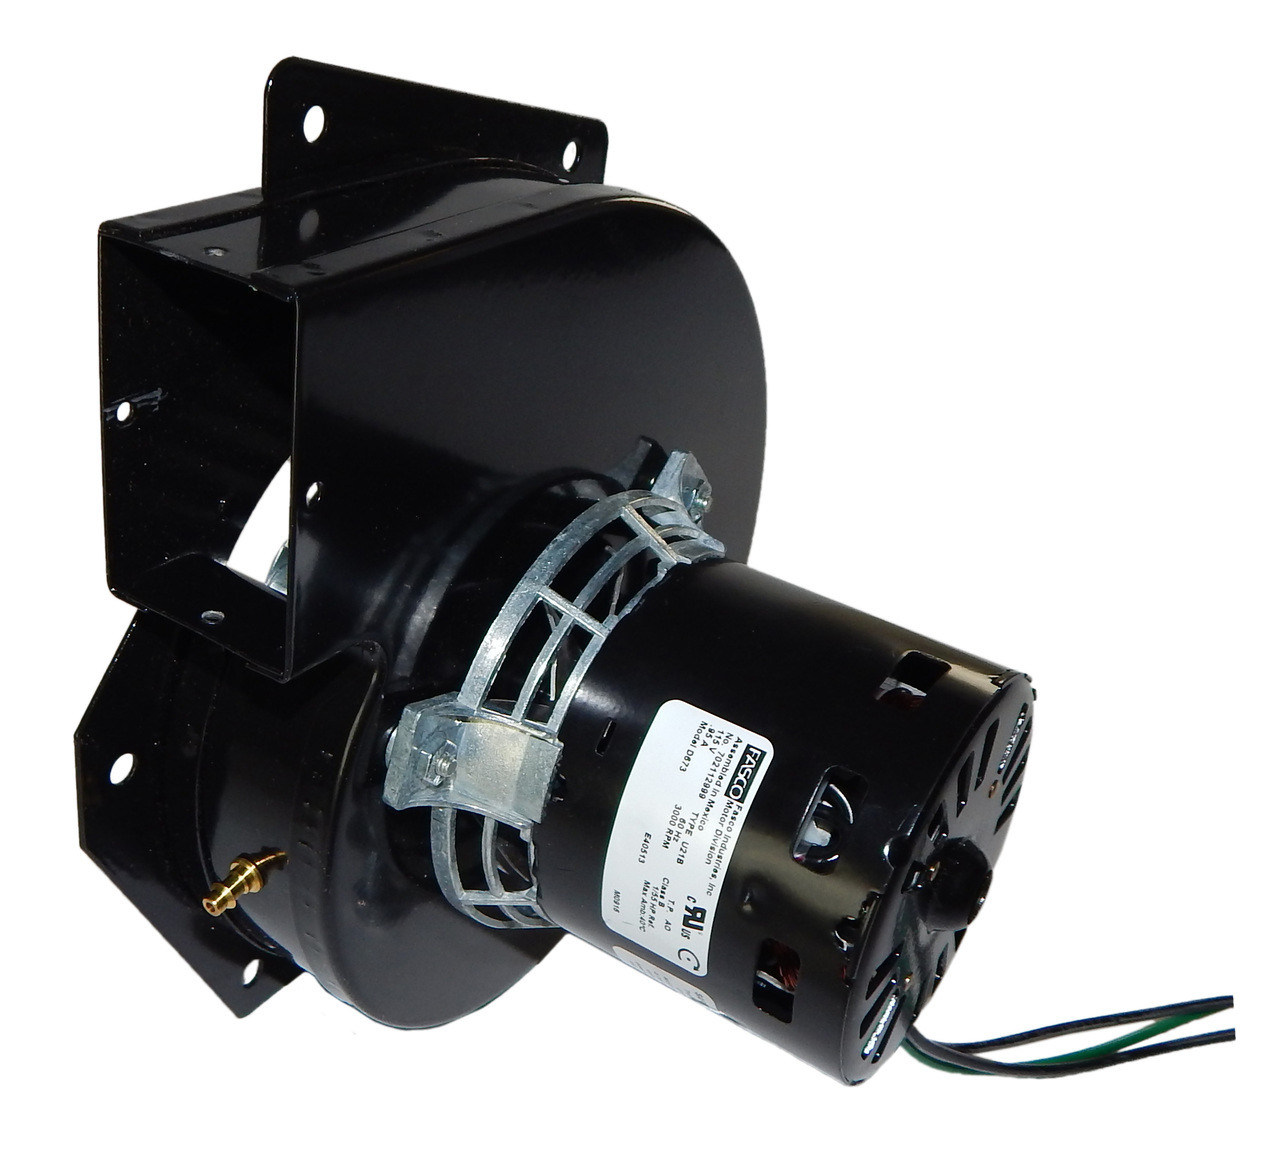 small resolution of  manual d673 46064 1468505744 1280 1280 c 2 rgpn 05eauer wiring diagram rheem rgps rheem rudd furnace blower motors